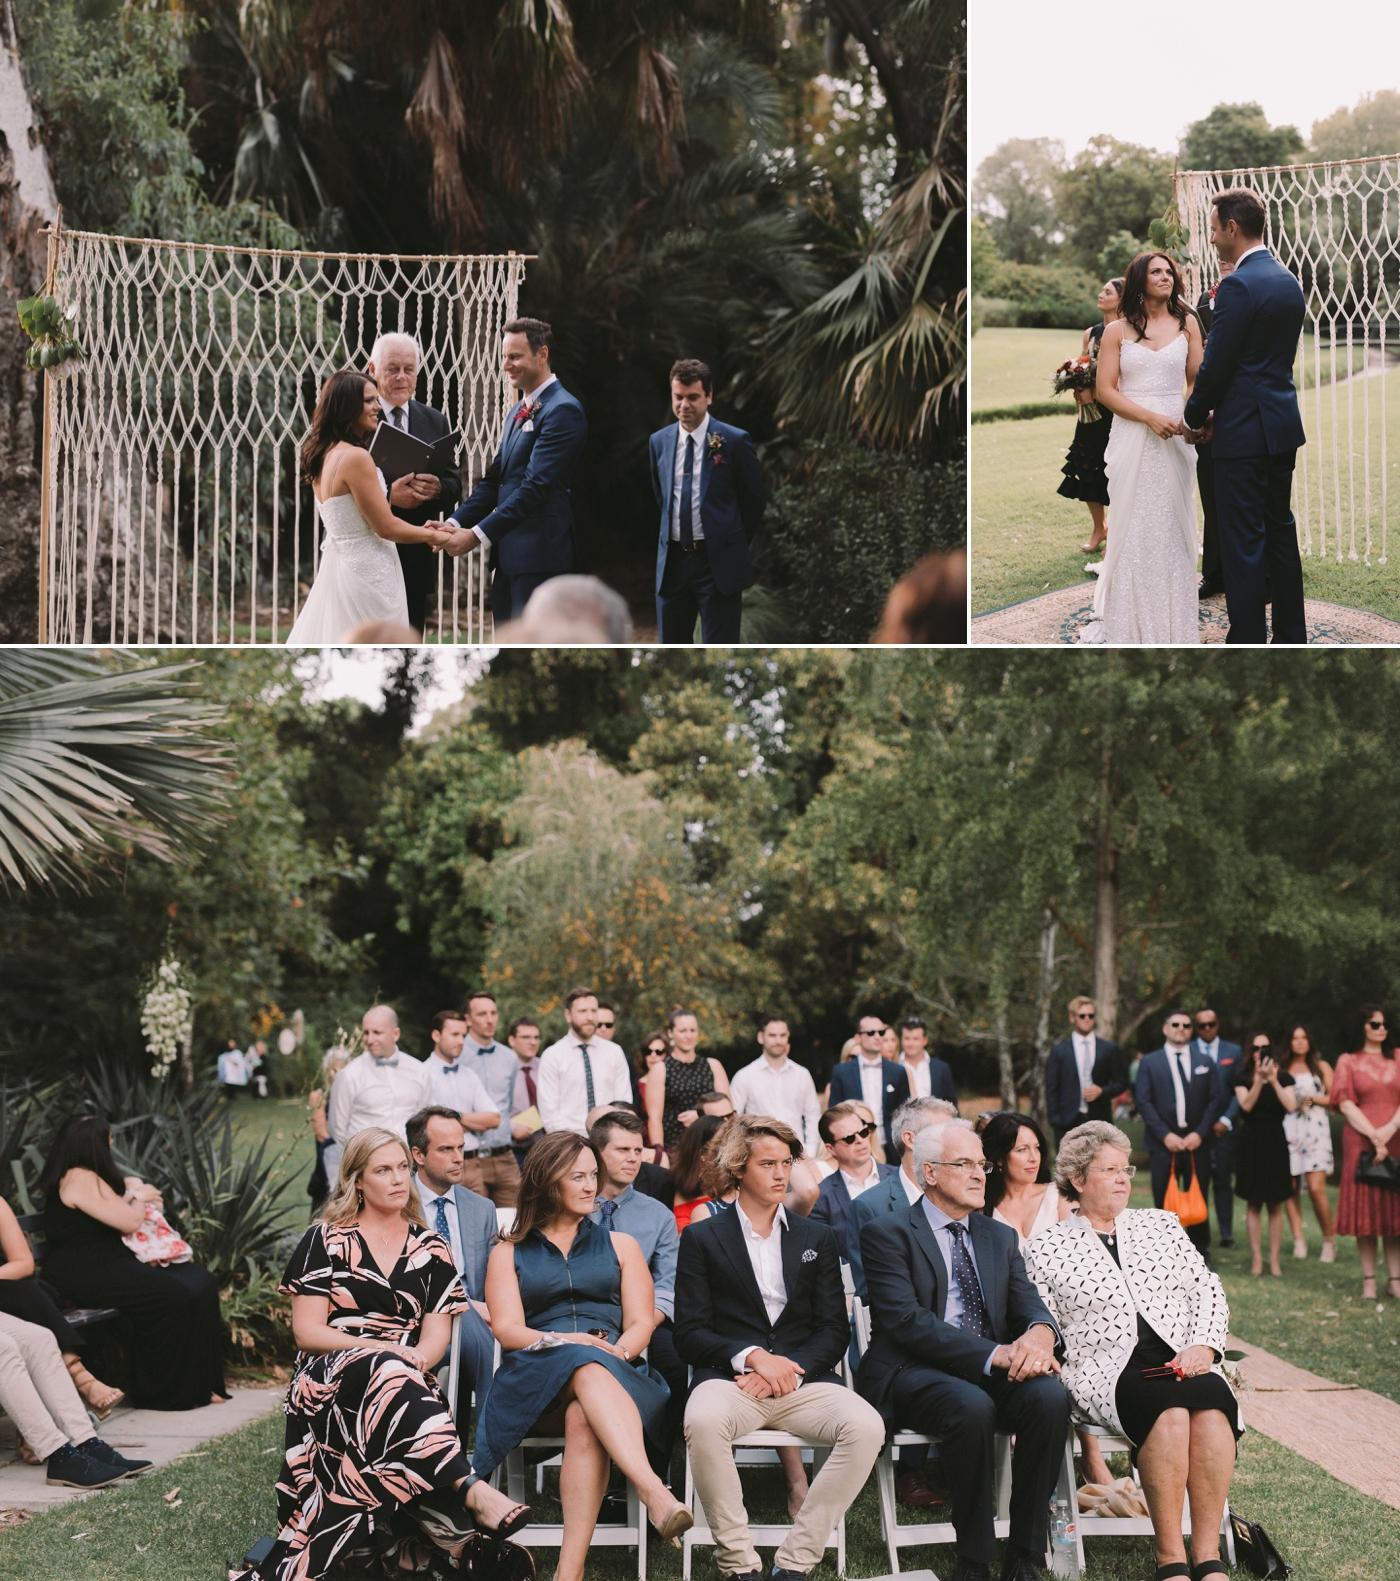 Kellie & Brent - Adelaide City Wedding - Natural wedding photography in Adelaide - Katherine Schultz - www.katherineschultzphotography.com 38